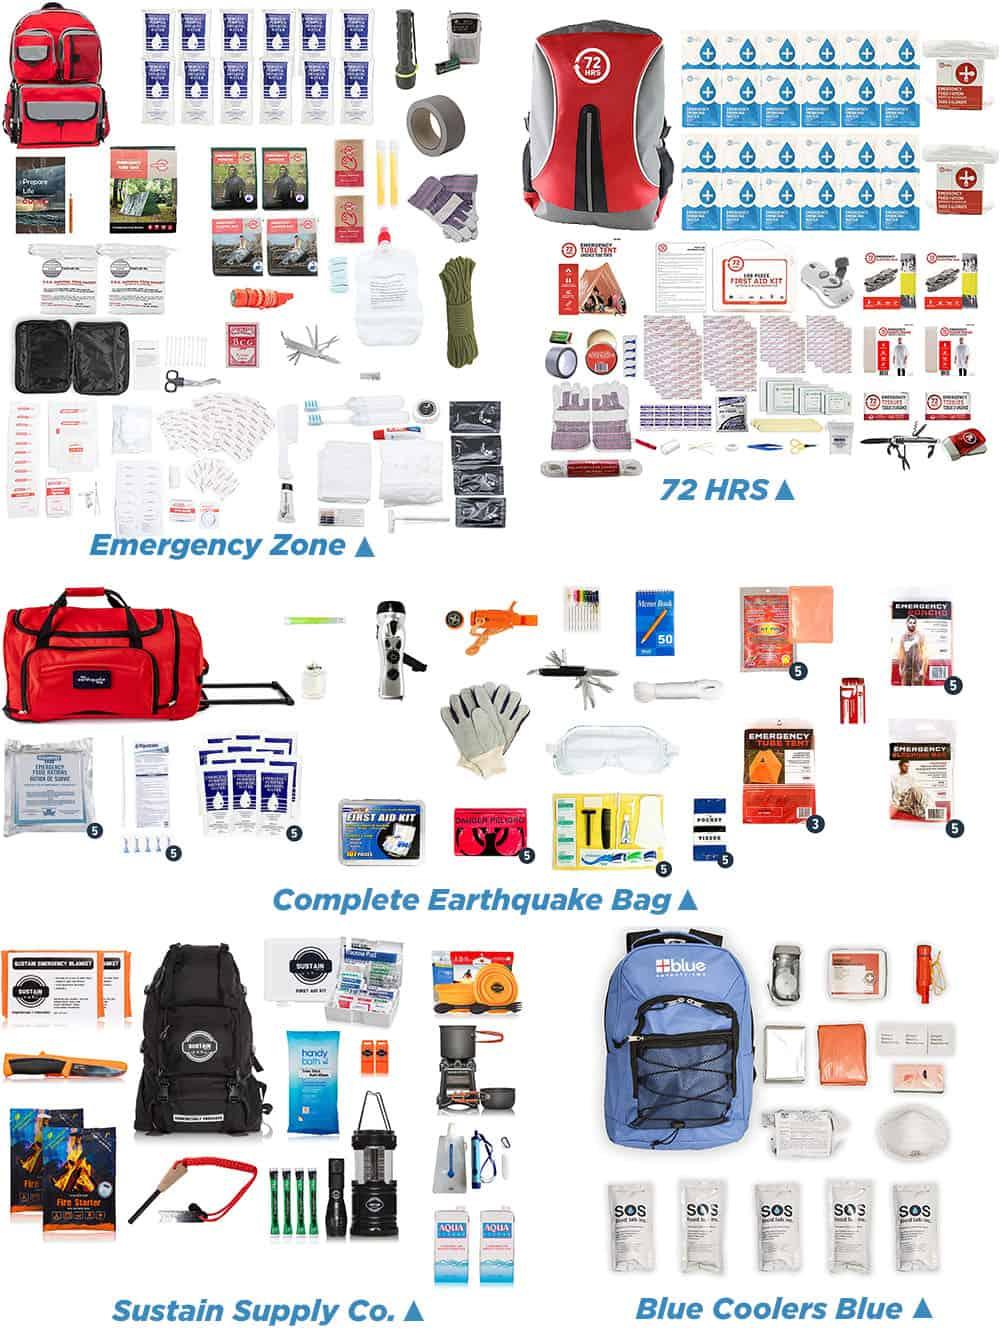 Earthquake Kits Items Comparison